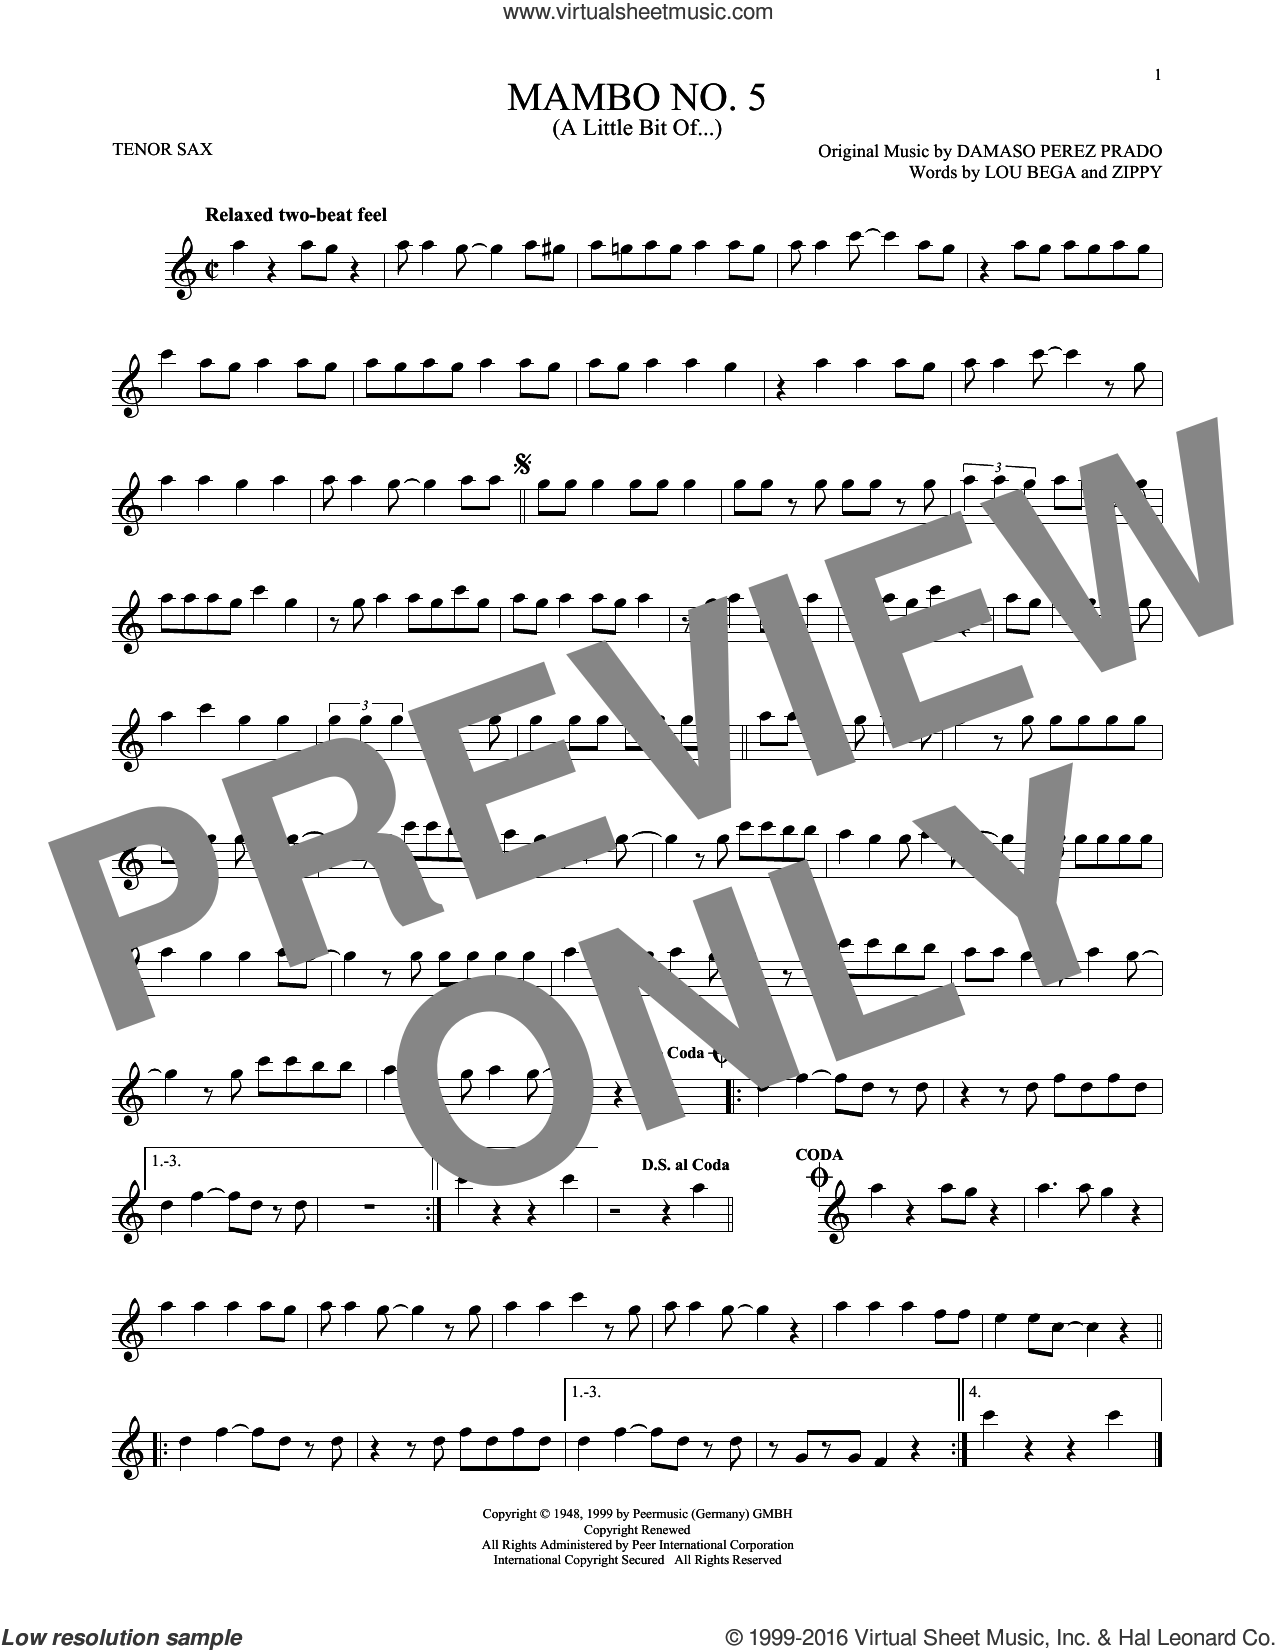 Mambo No. 5 (A Little Bit Of...) sheet music for tenor saxophone solo by Lou Bega, Damaso Perez Prado and Zippy, intermediate skill level